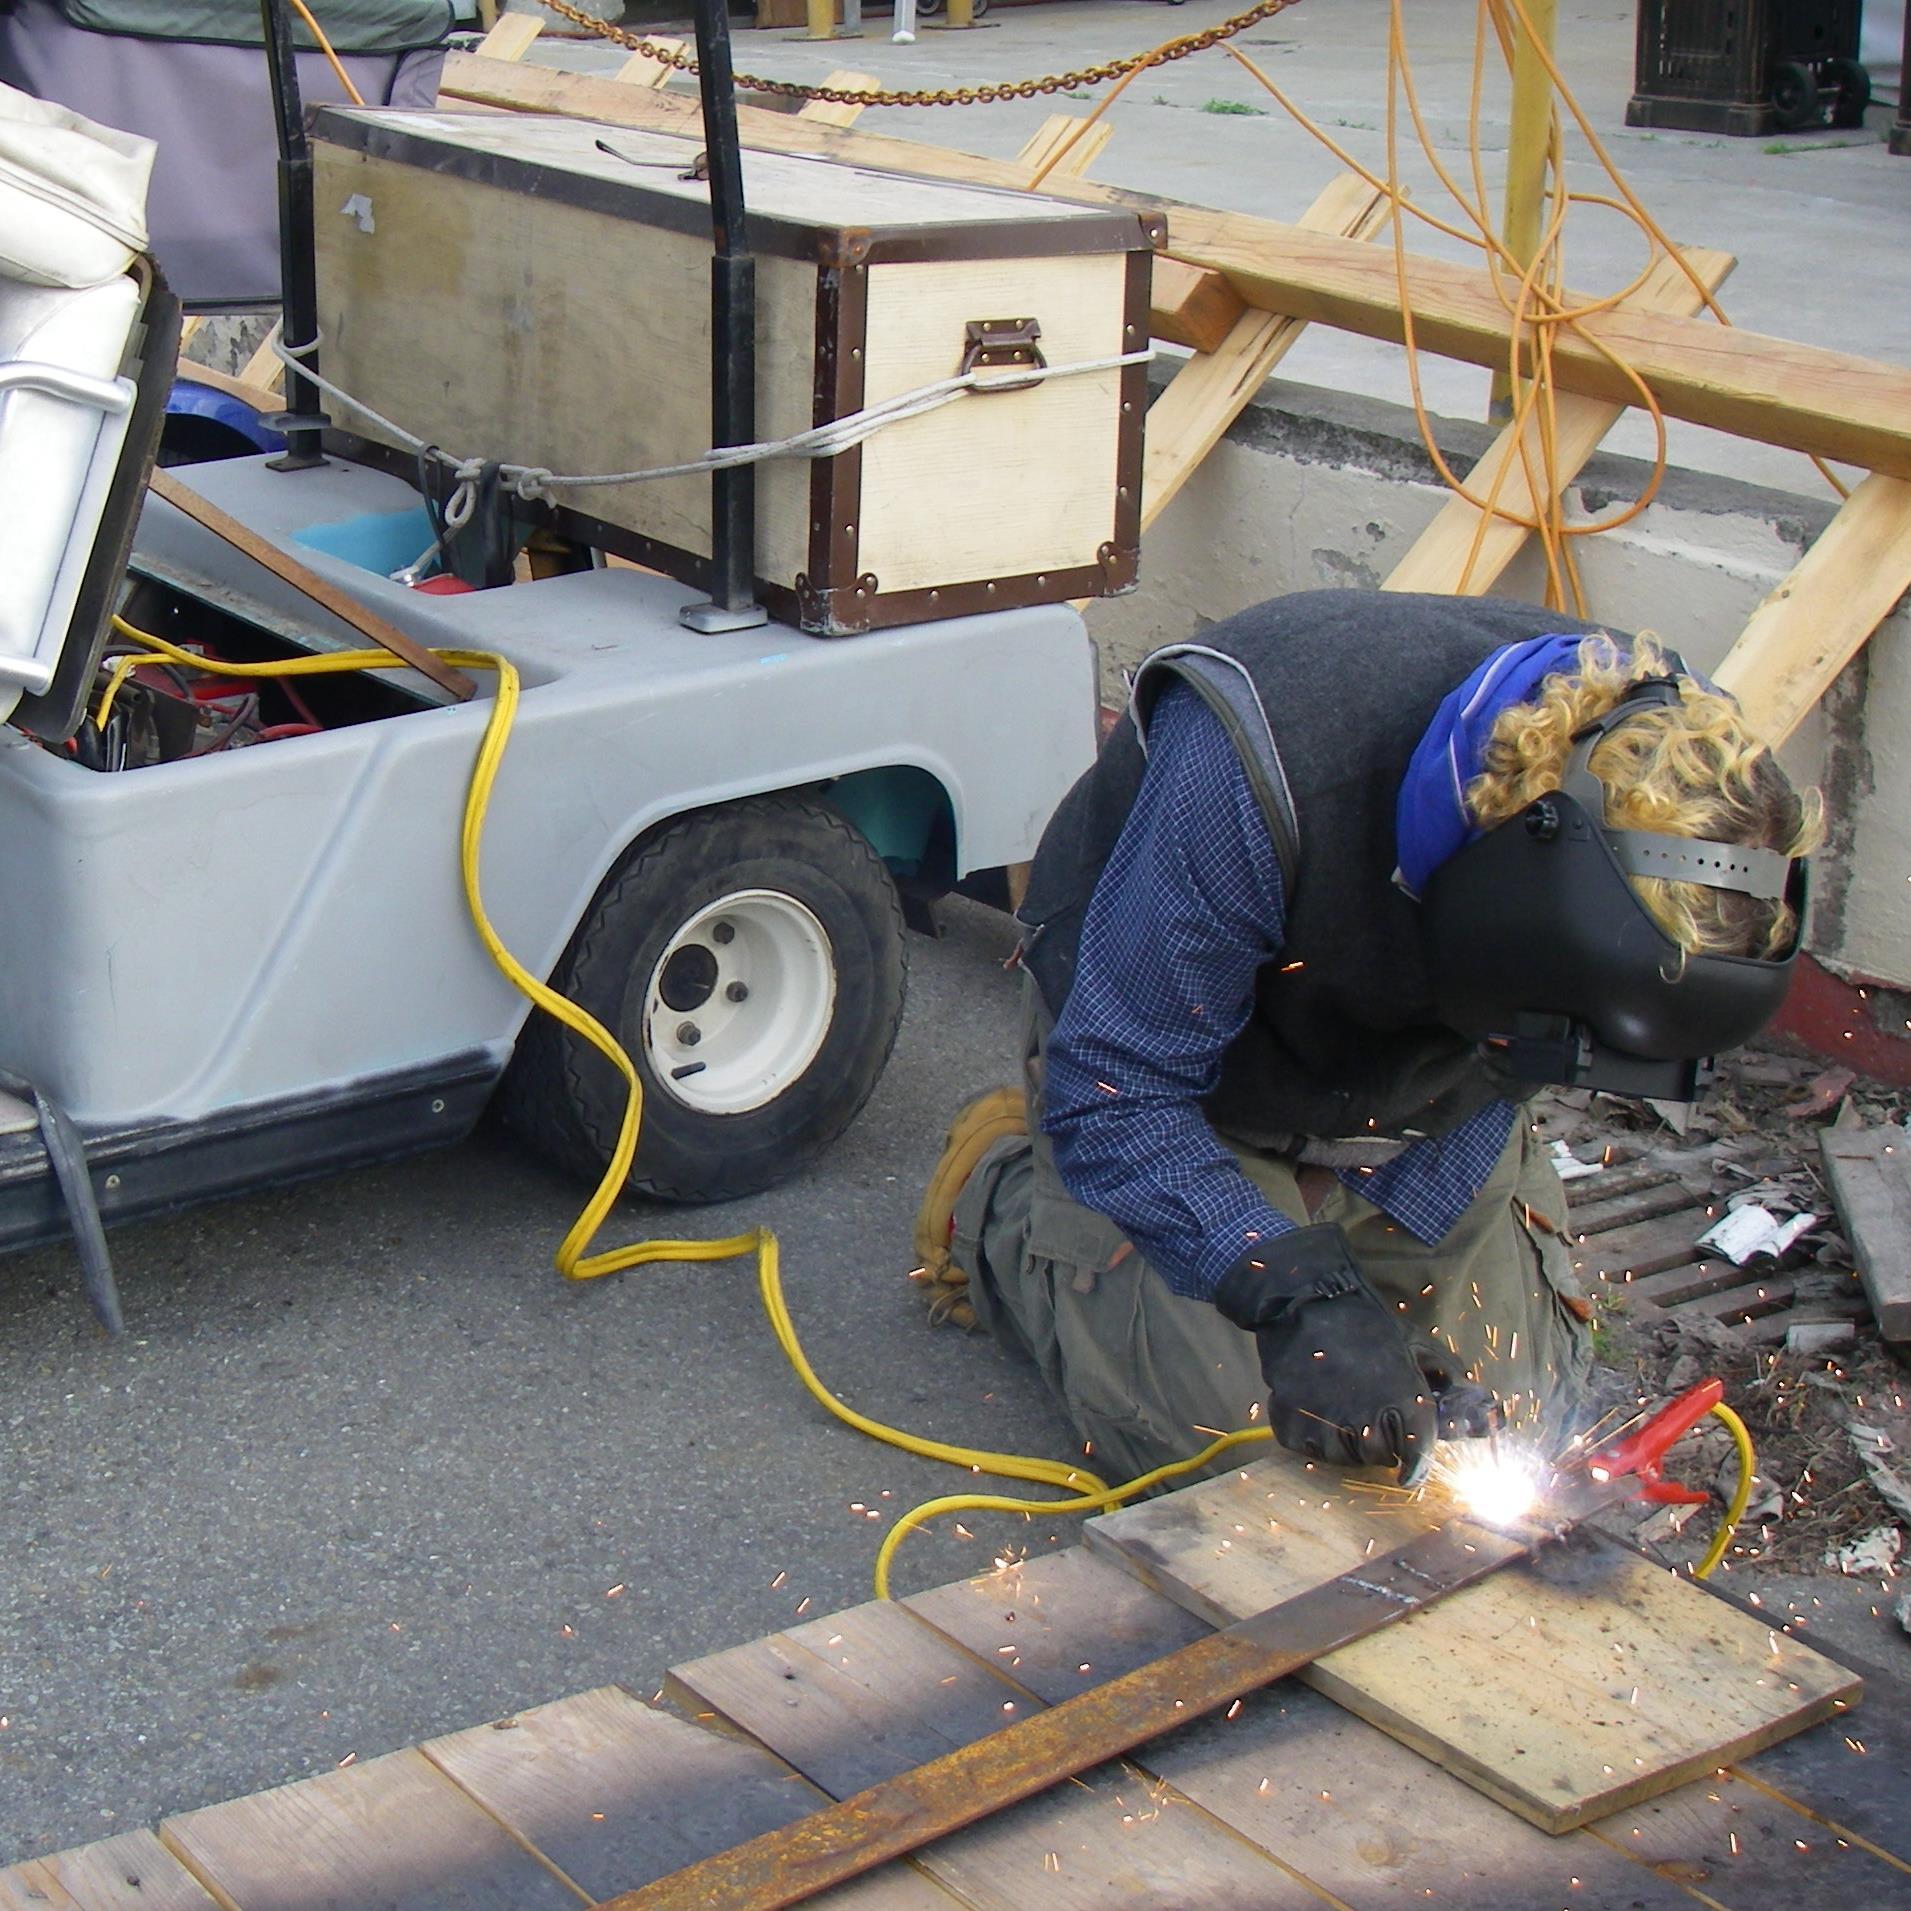 Batteries + Jumpercables = DC Welder